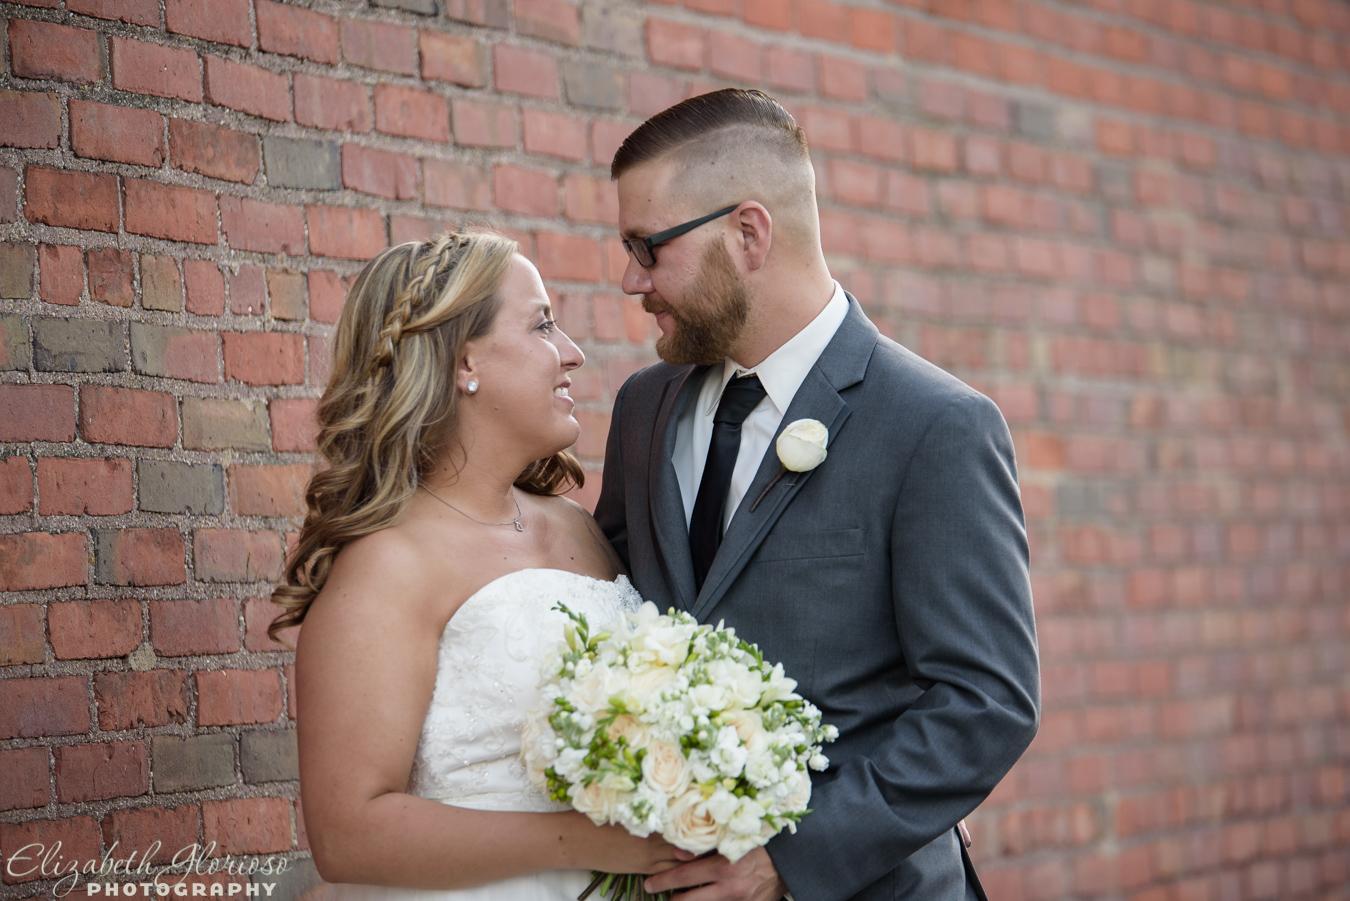 Zakovec_Wedding_Glorioso_Photography_Cleveland-133